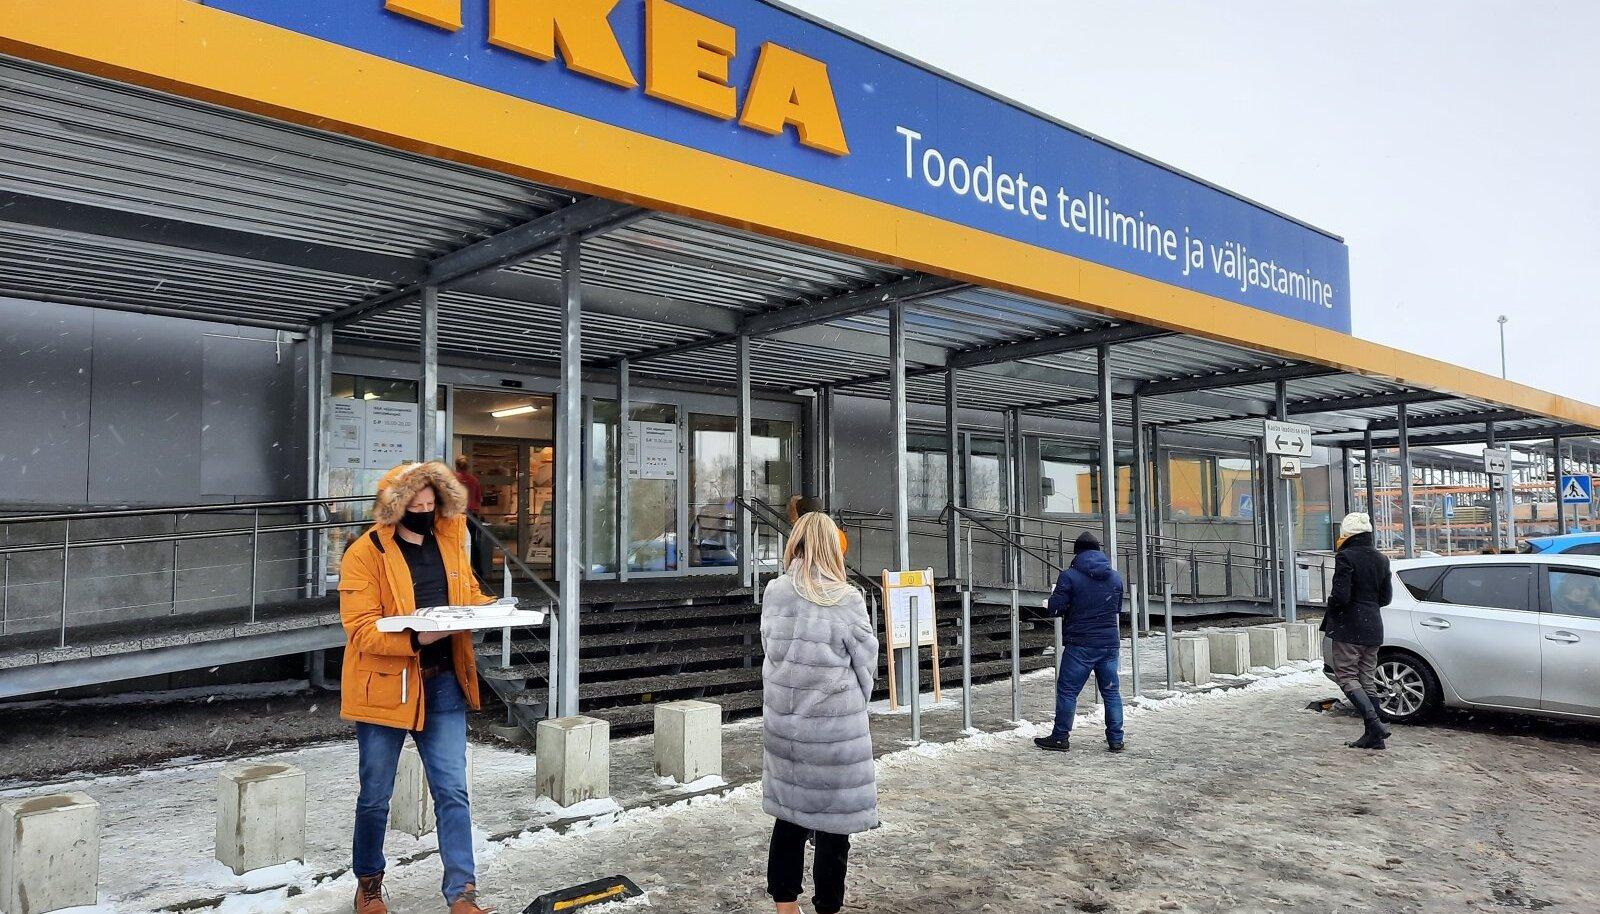 IKEA Tallinna tellimiskeskus